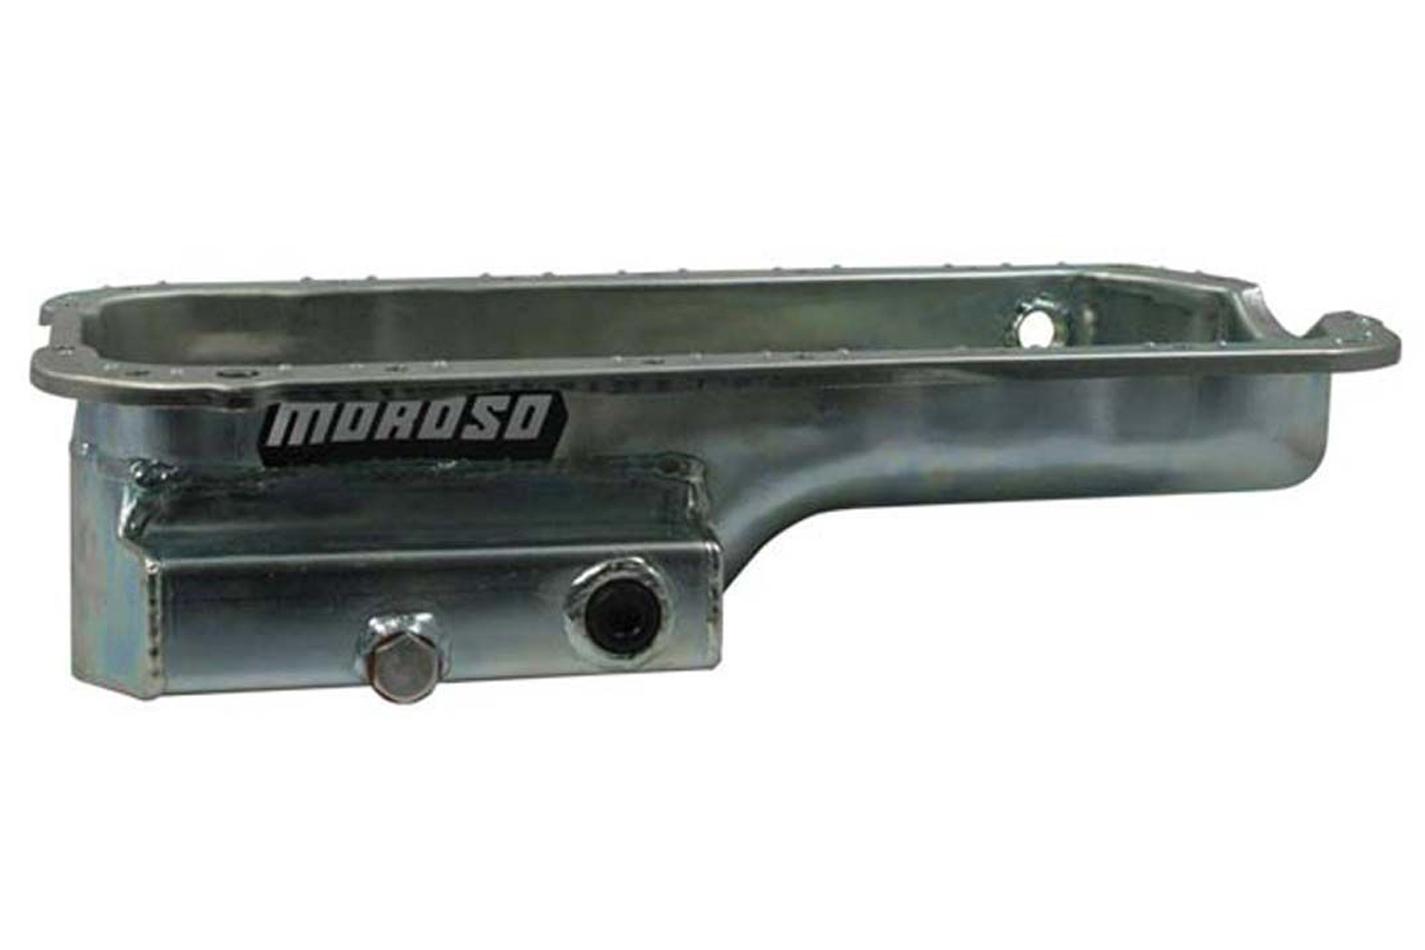 Moroso 20917 Engine Oil Pan, Road / Drag Race, 7 qt, 5.522 in Deep, Steel, Zinc Oxide, Honda H-Series, Each